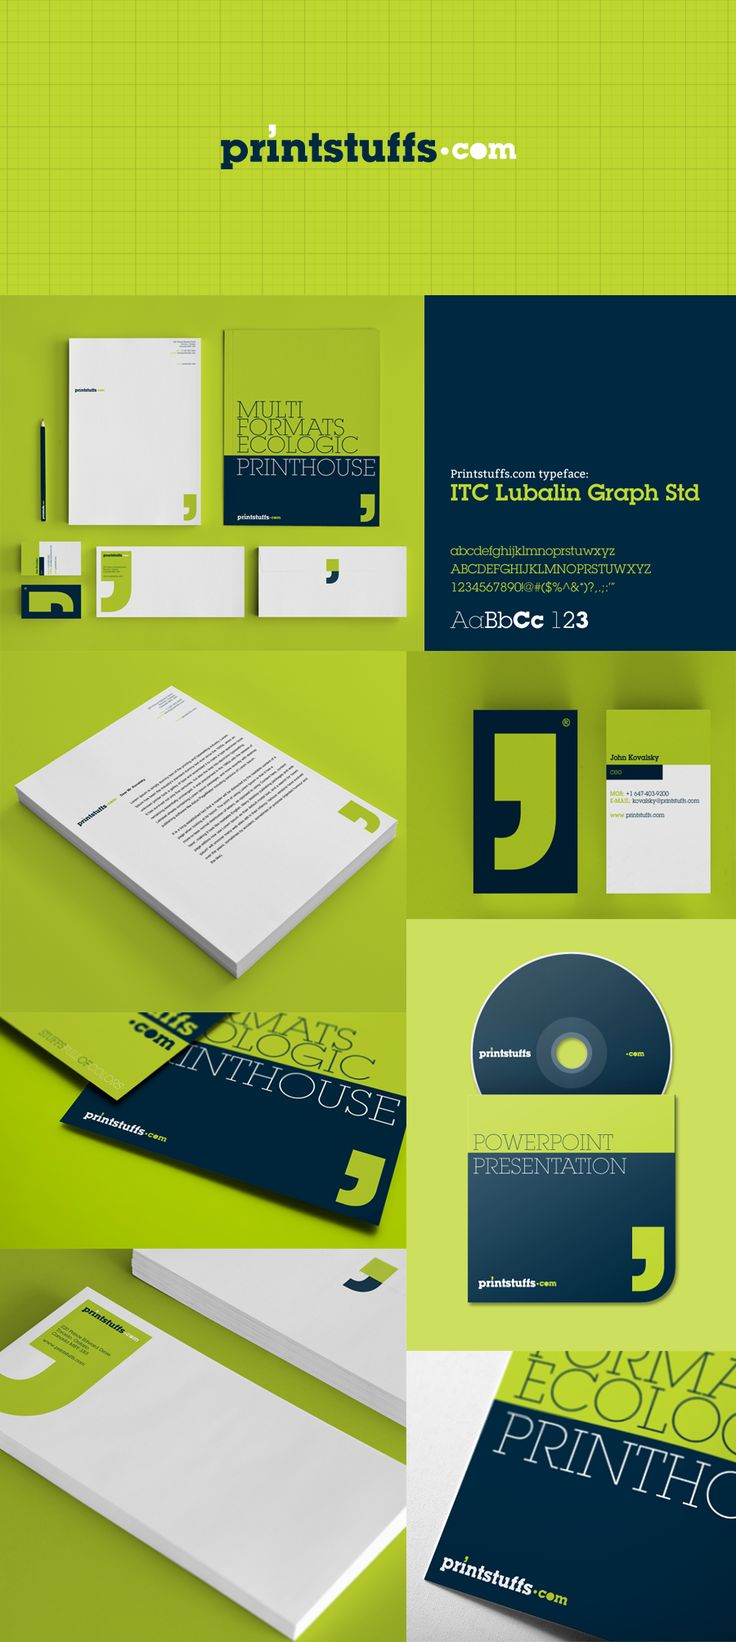 printstuffs.com #design #identity #branding #marketing